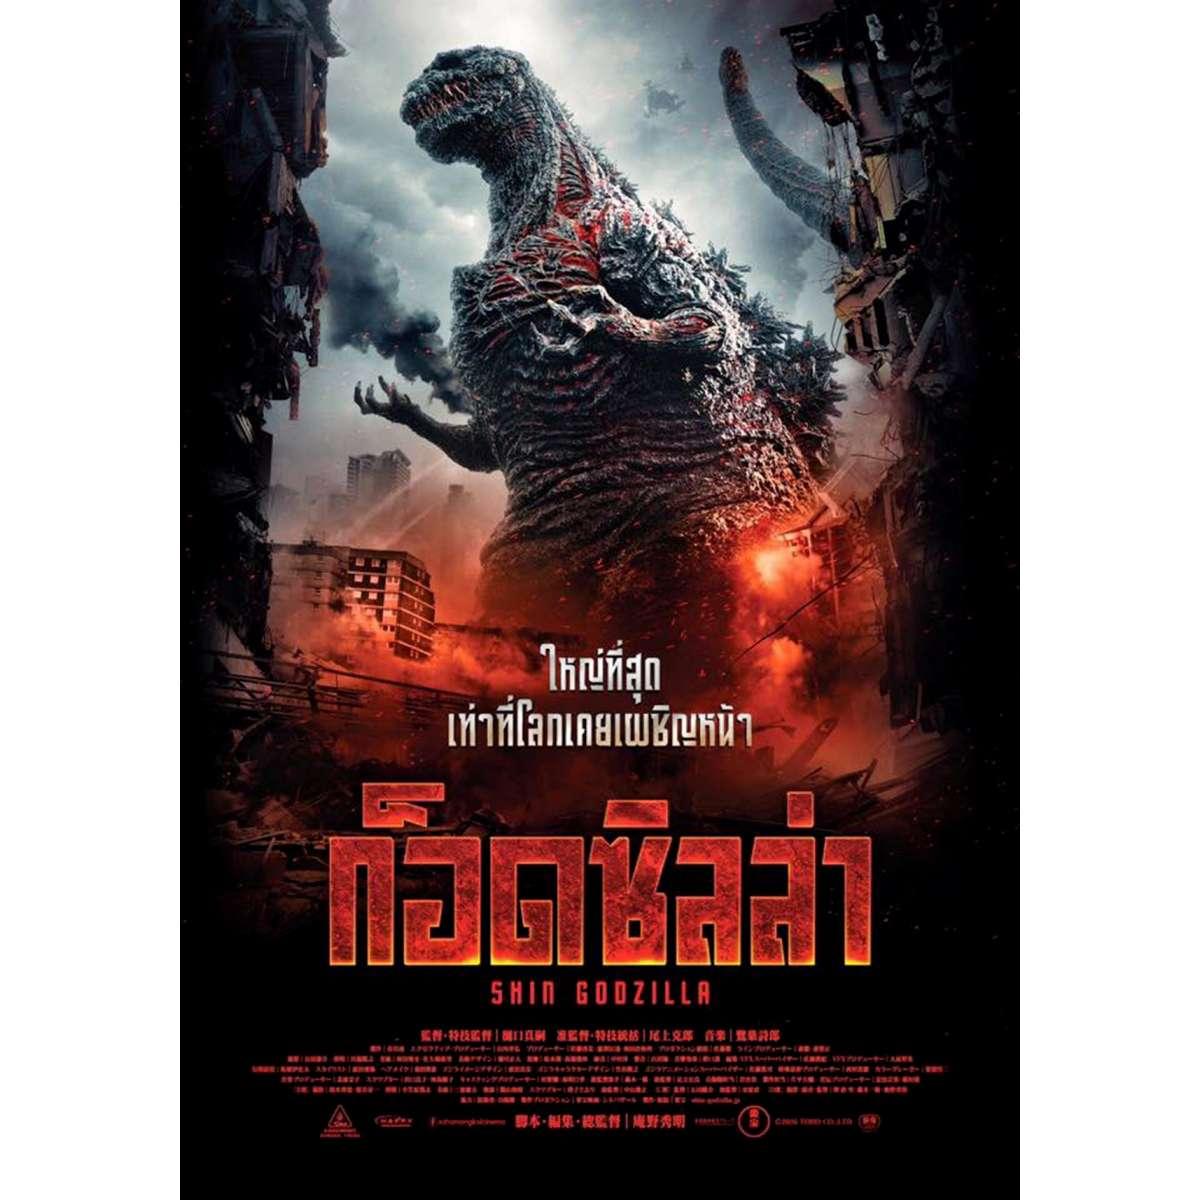 SHIN GODZILLA Original Thai Movie Poster DS - 2016